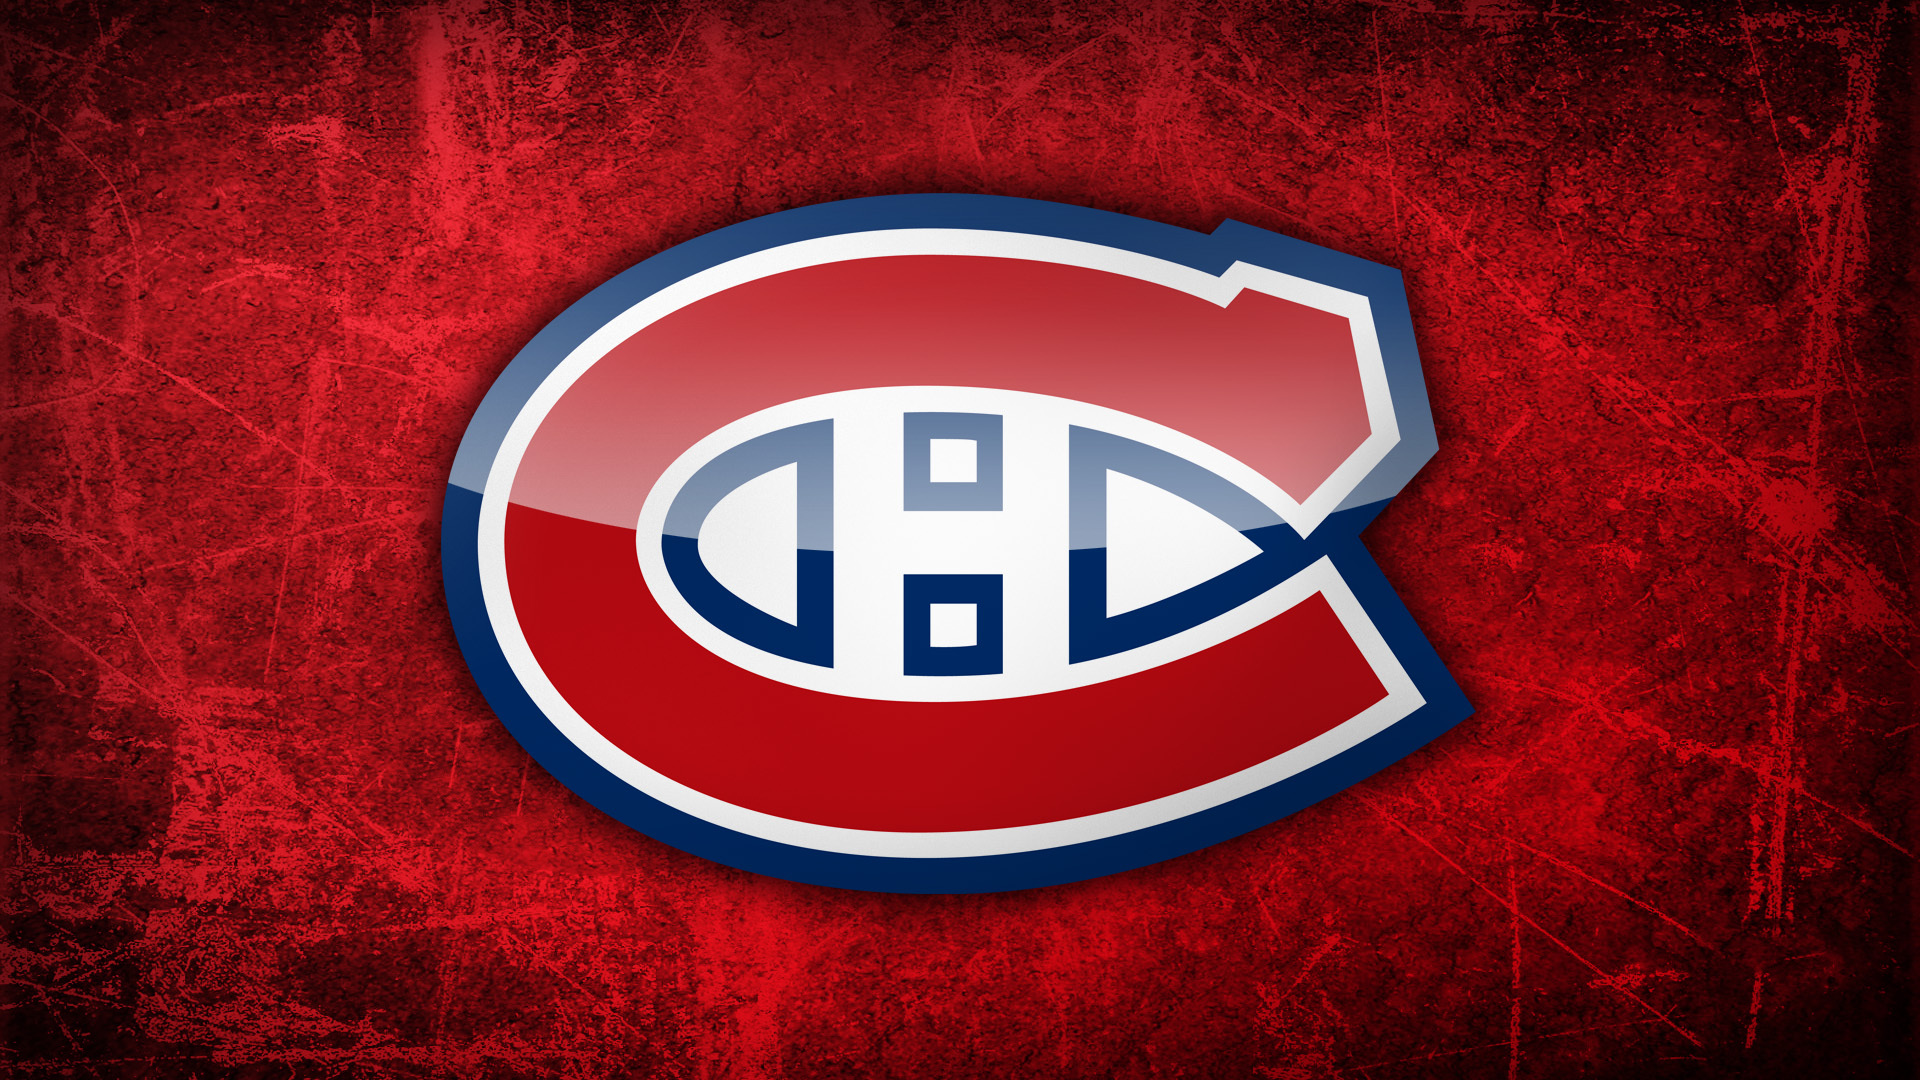 NHL Montreal Canadiens Montreal hockey wallpaper 1920x1080